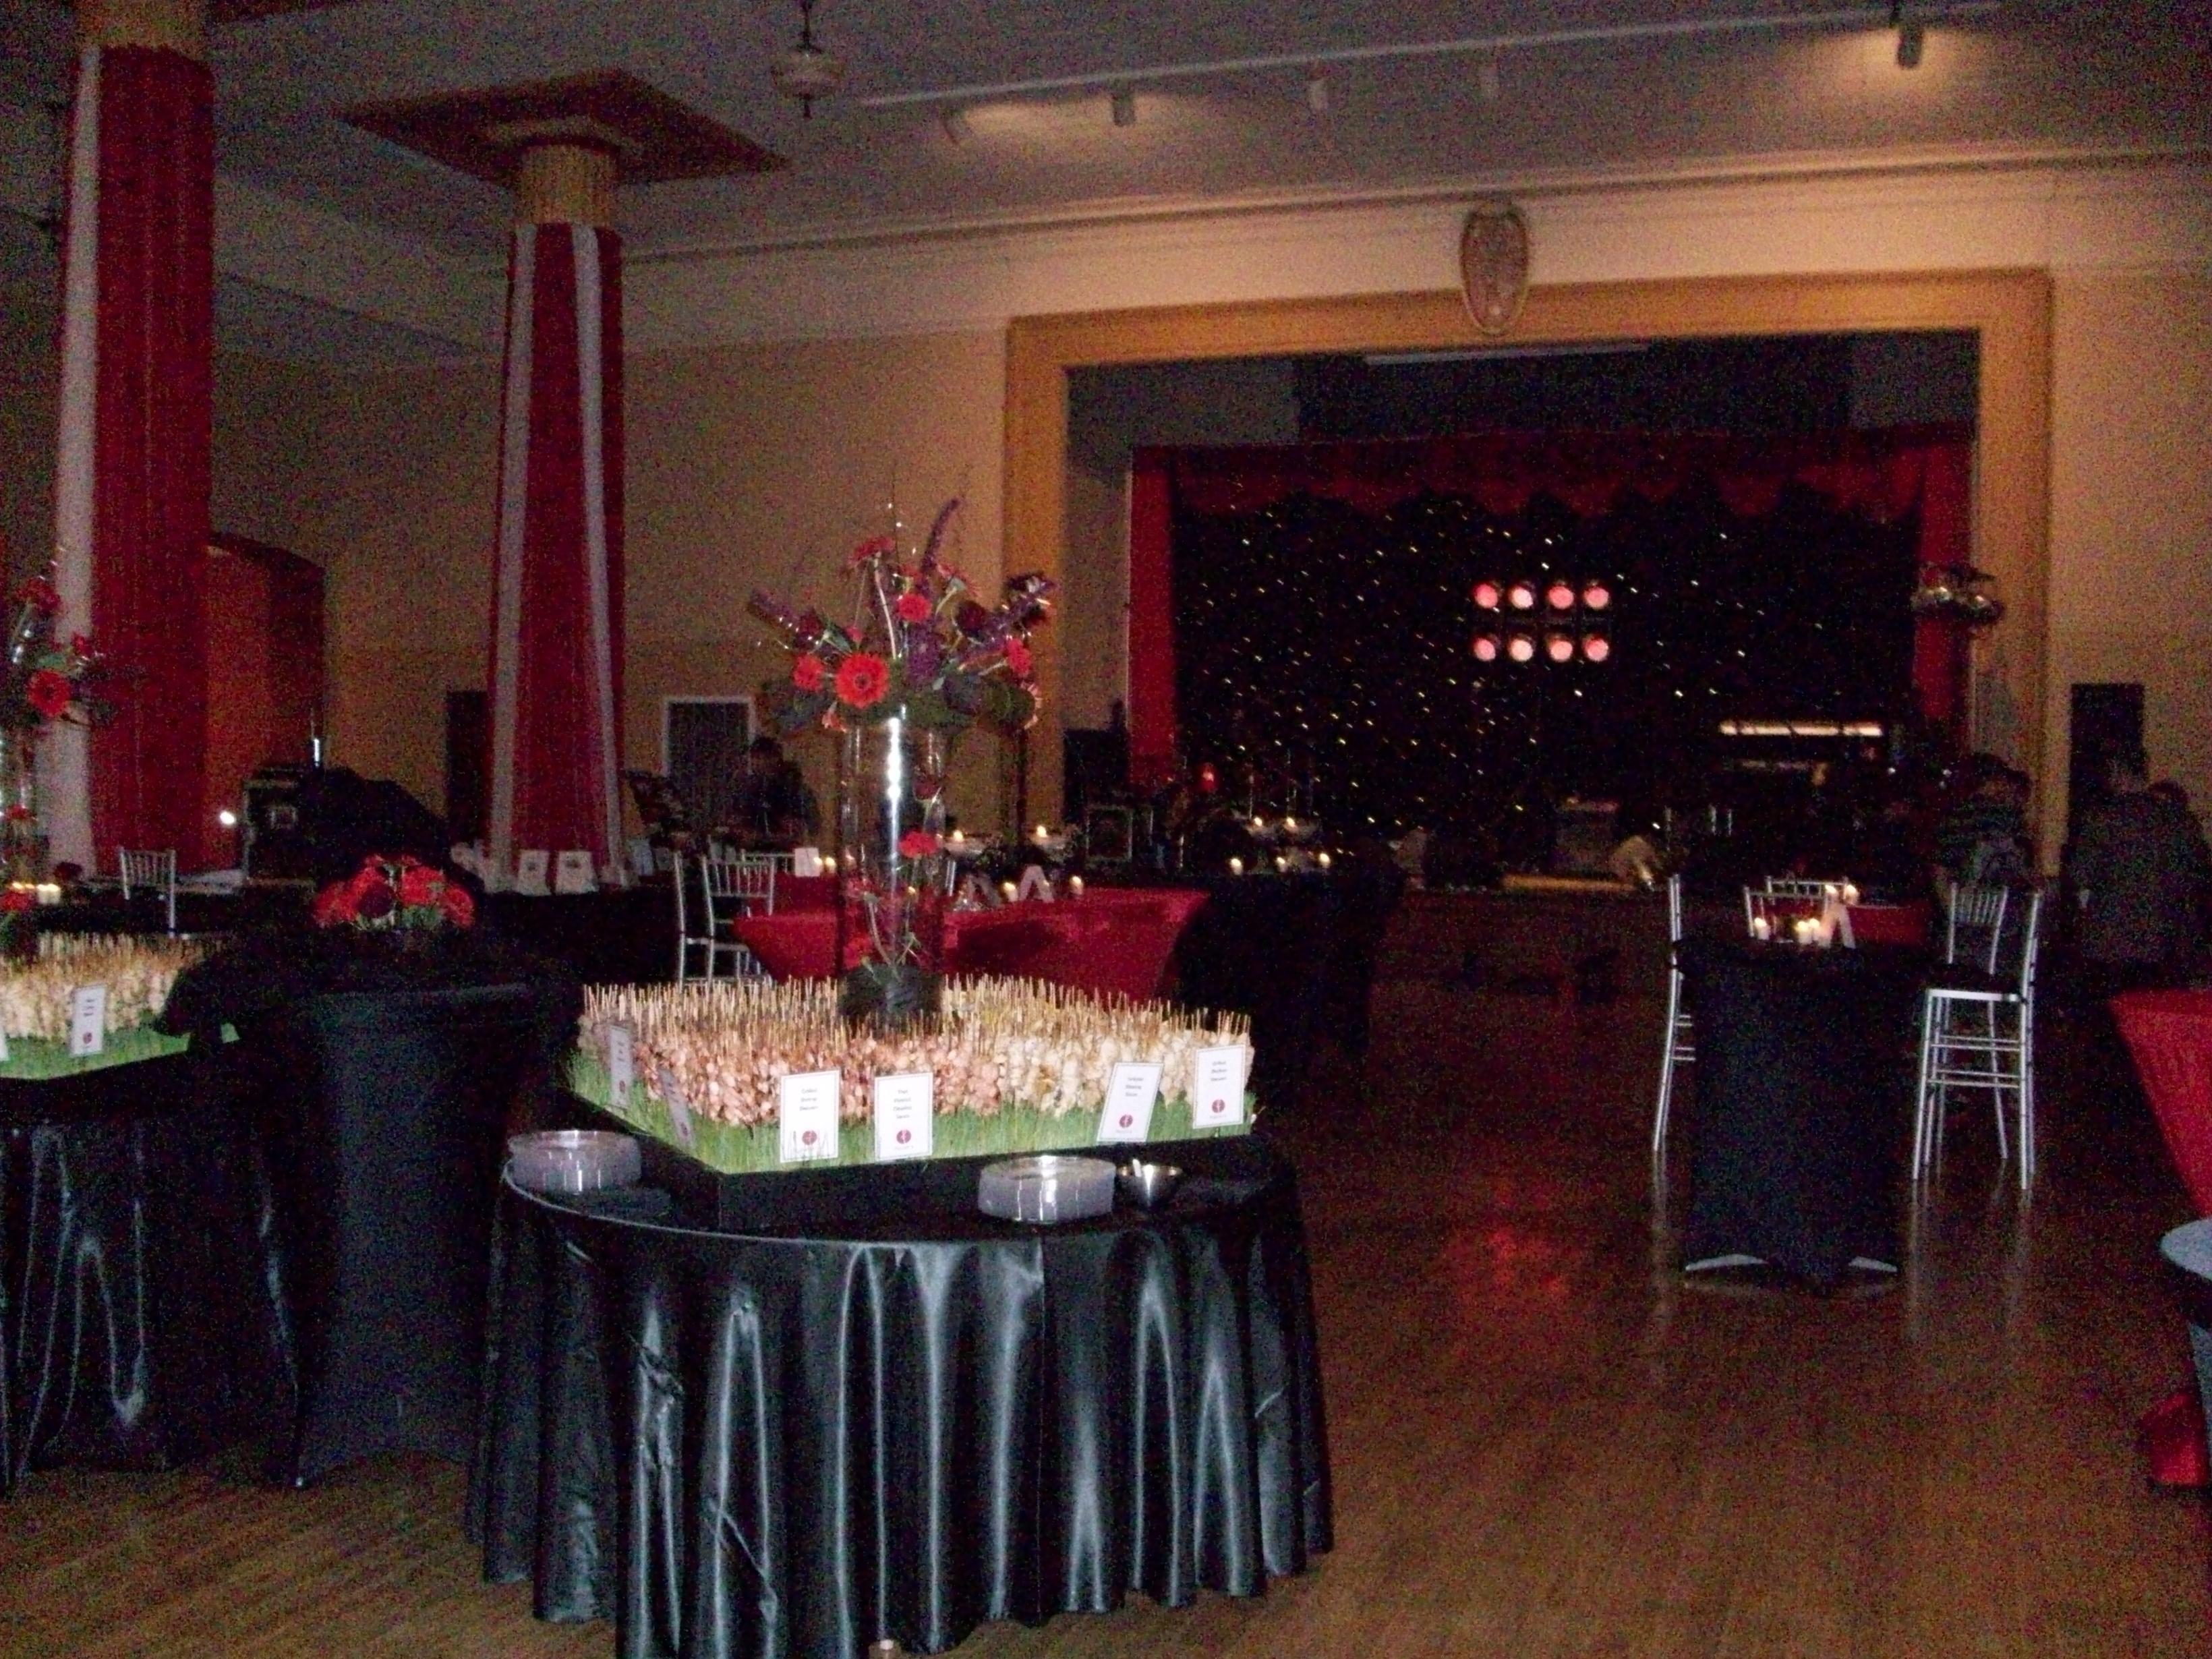 Des Moines Scottish Rite Consistory Grand Banquet Room